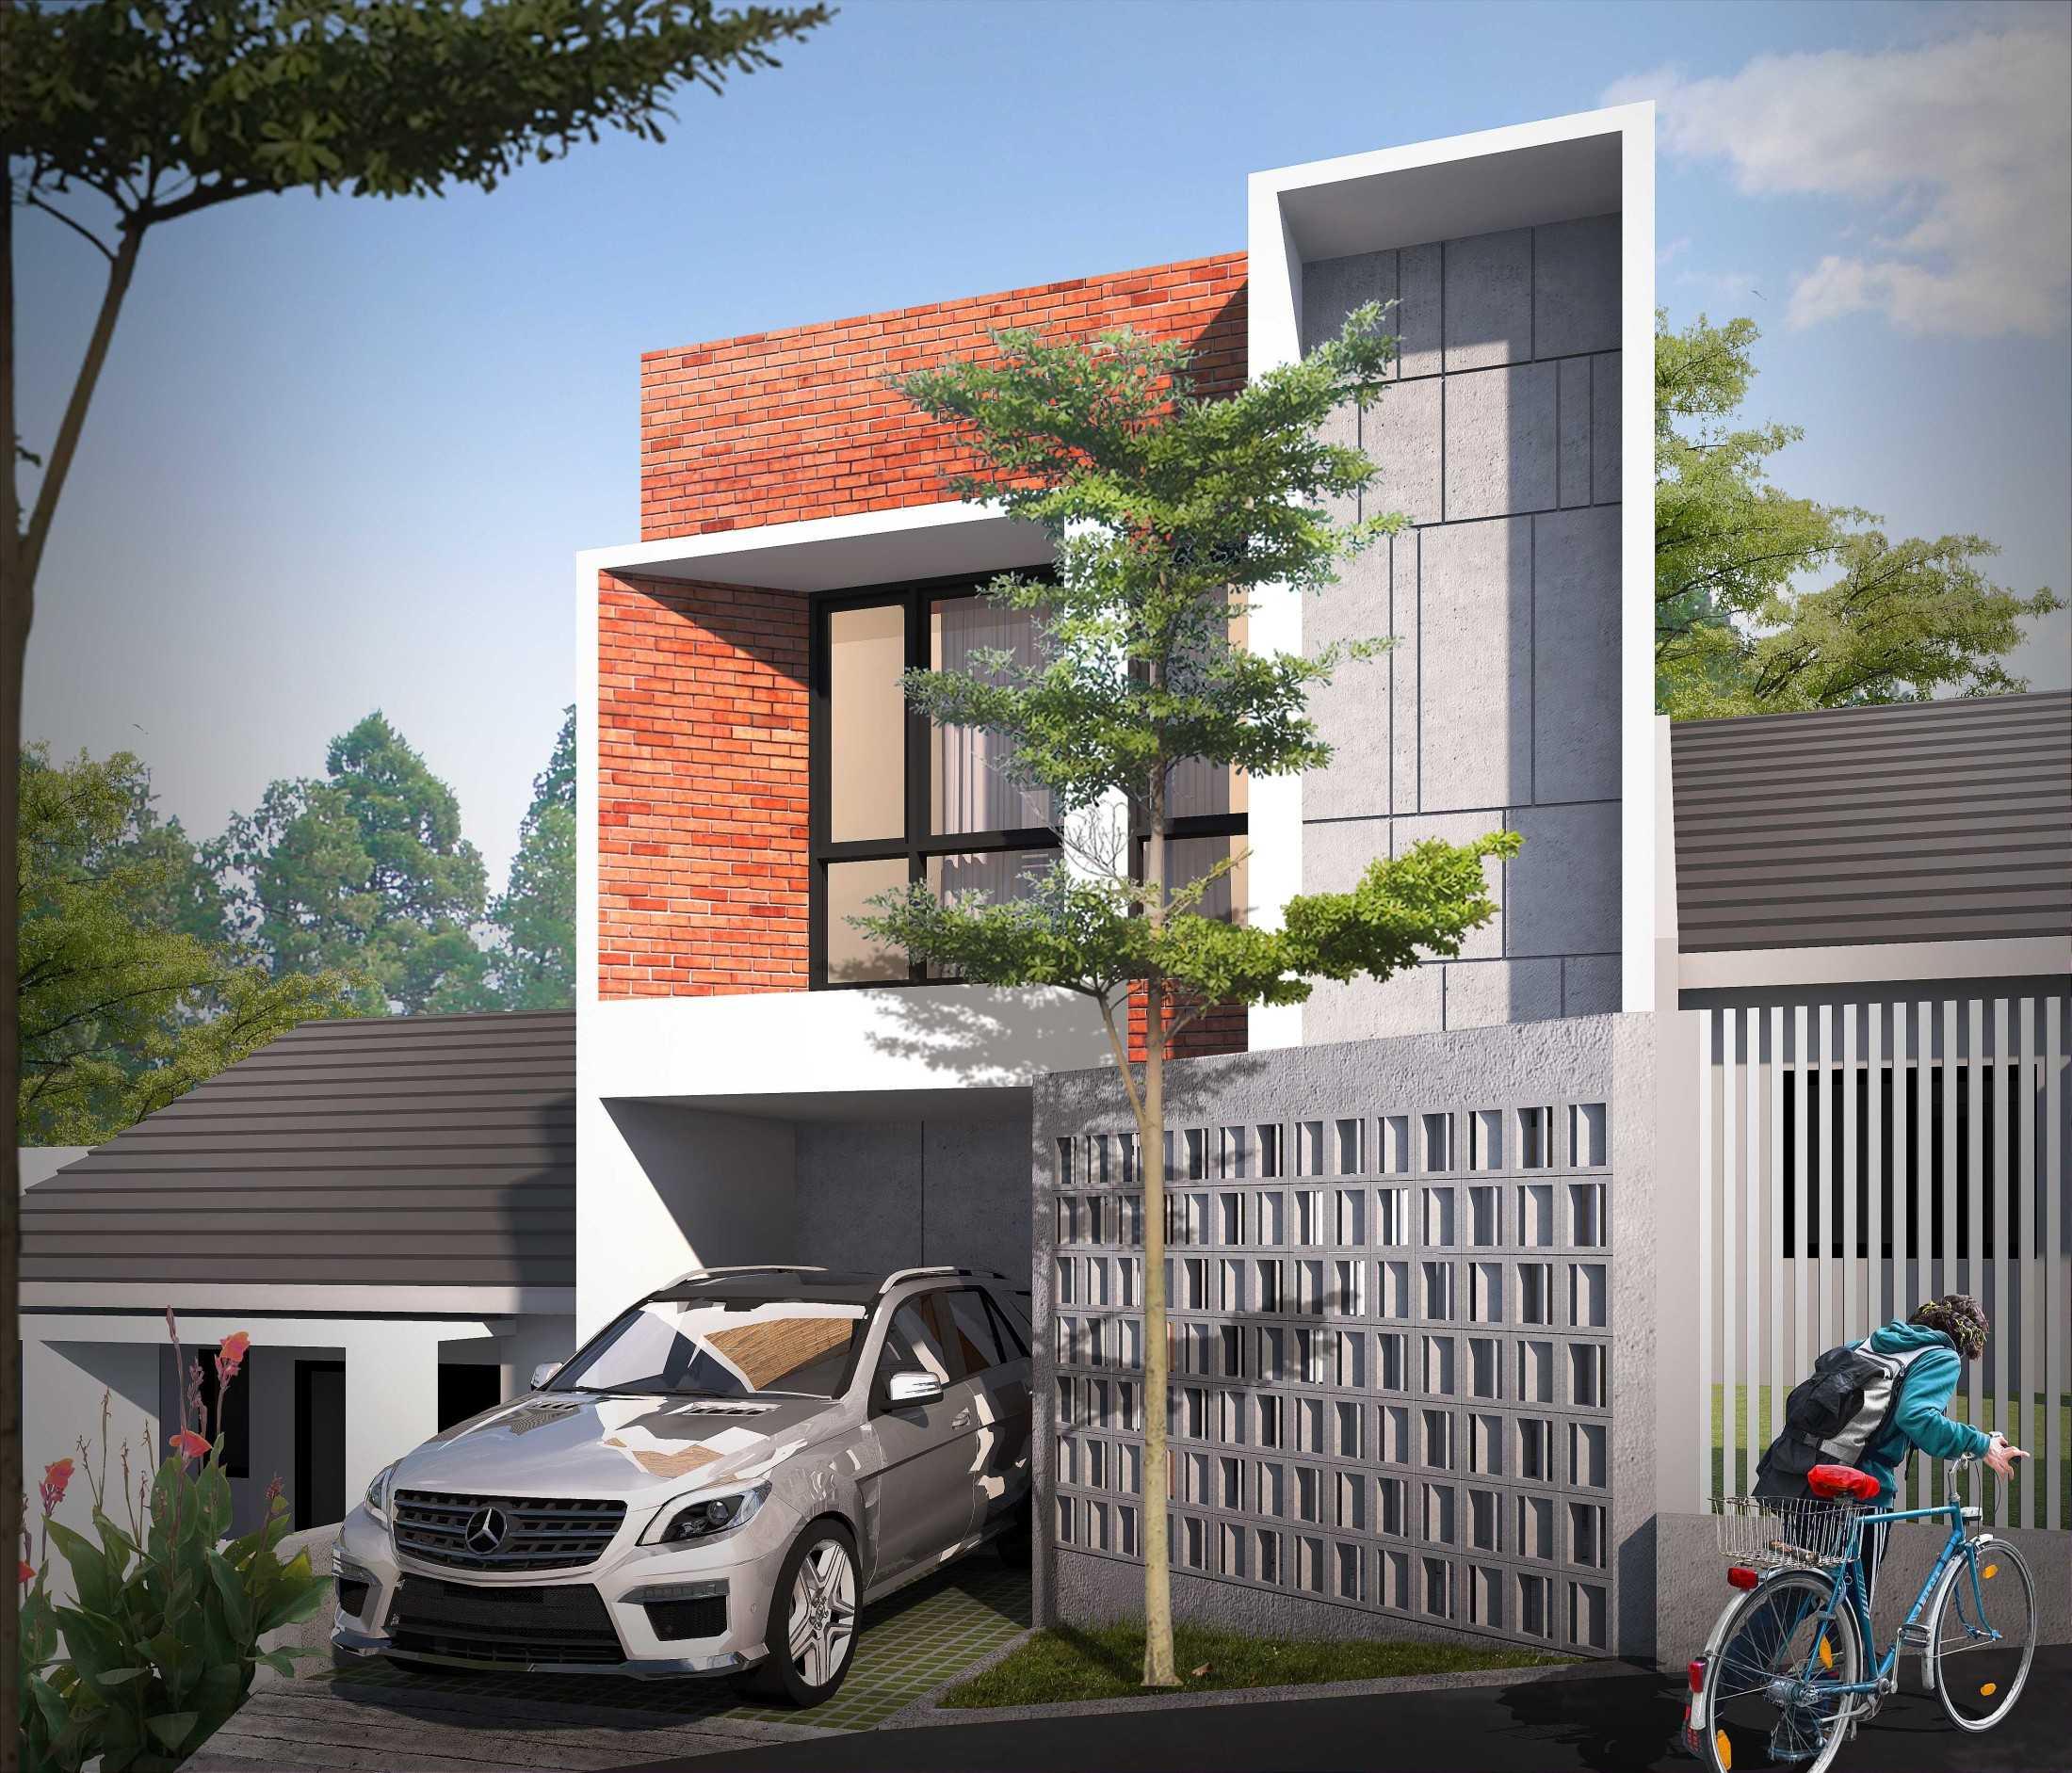 Gubah Ruang Z House Bandung, Kota Bandung, Jawa Barat, Indonesia Bandung, Kota Bandung, Jawa Barat, Indonesia Gubah-Ruang-Studio-Z-House  71348